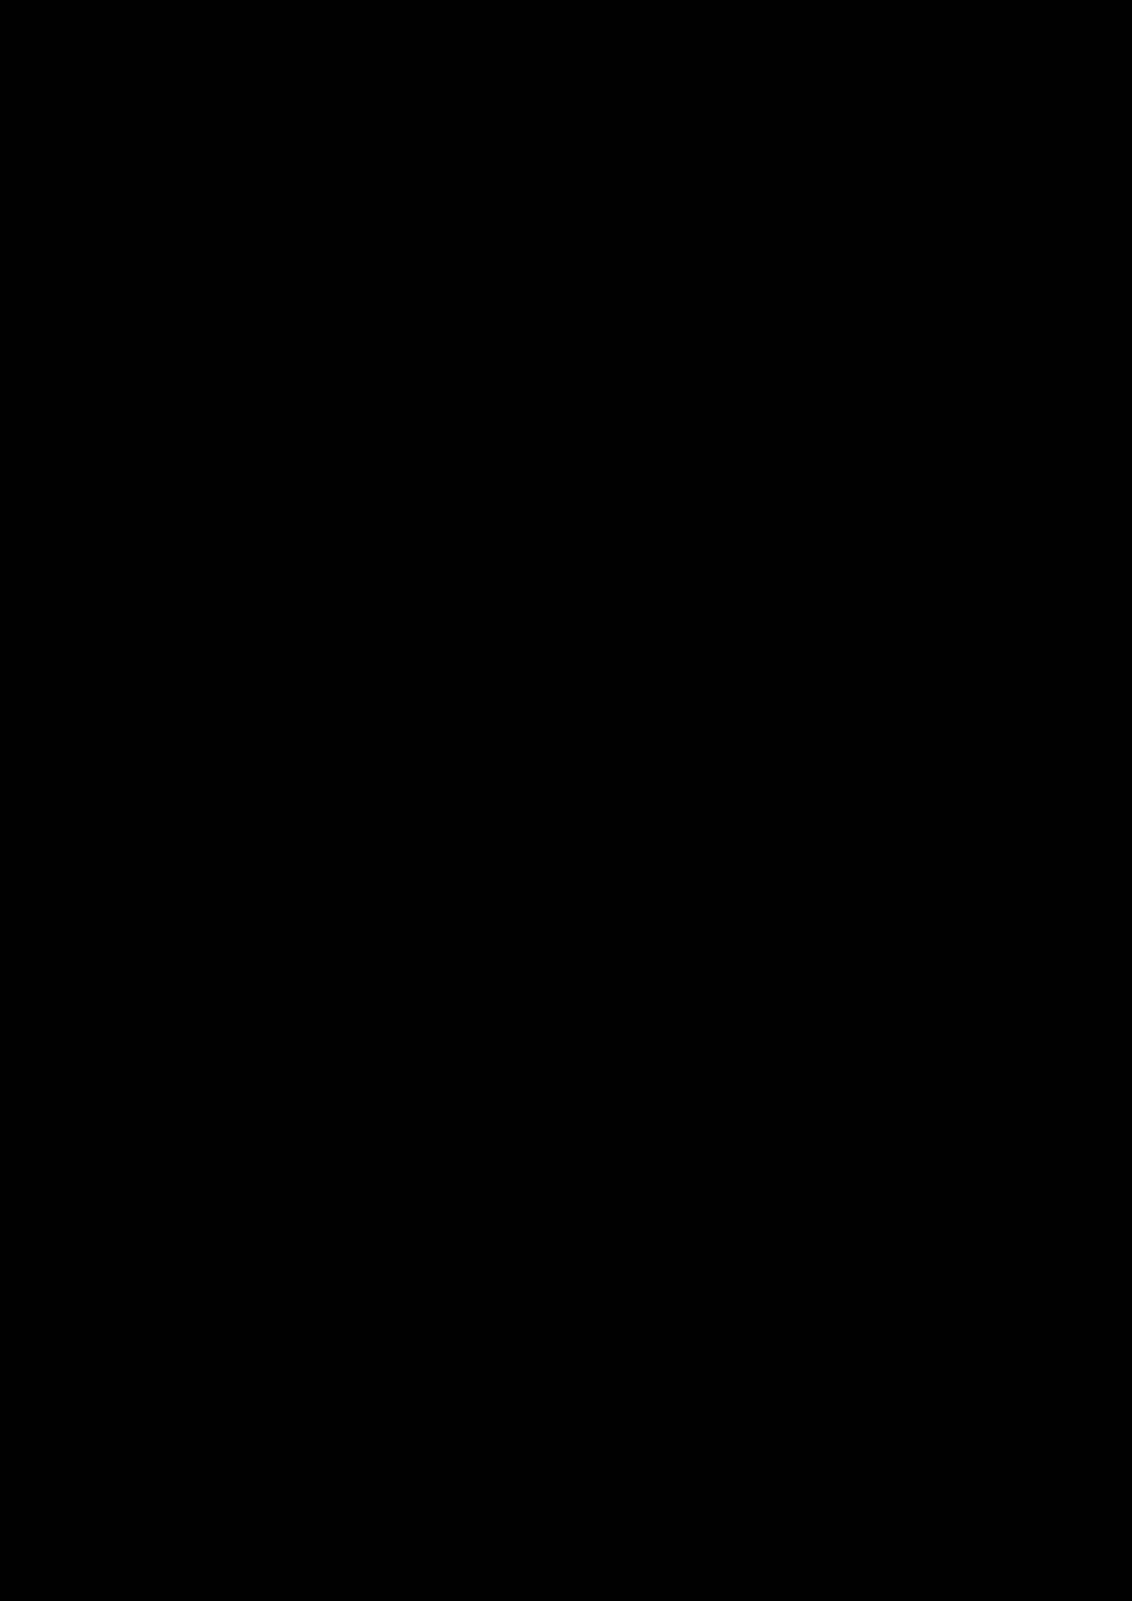 Ten lyubvi slide, Image 11